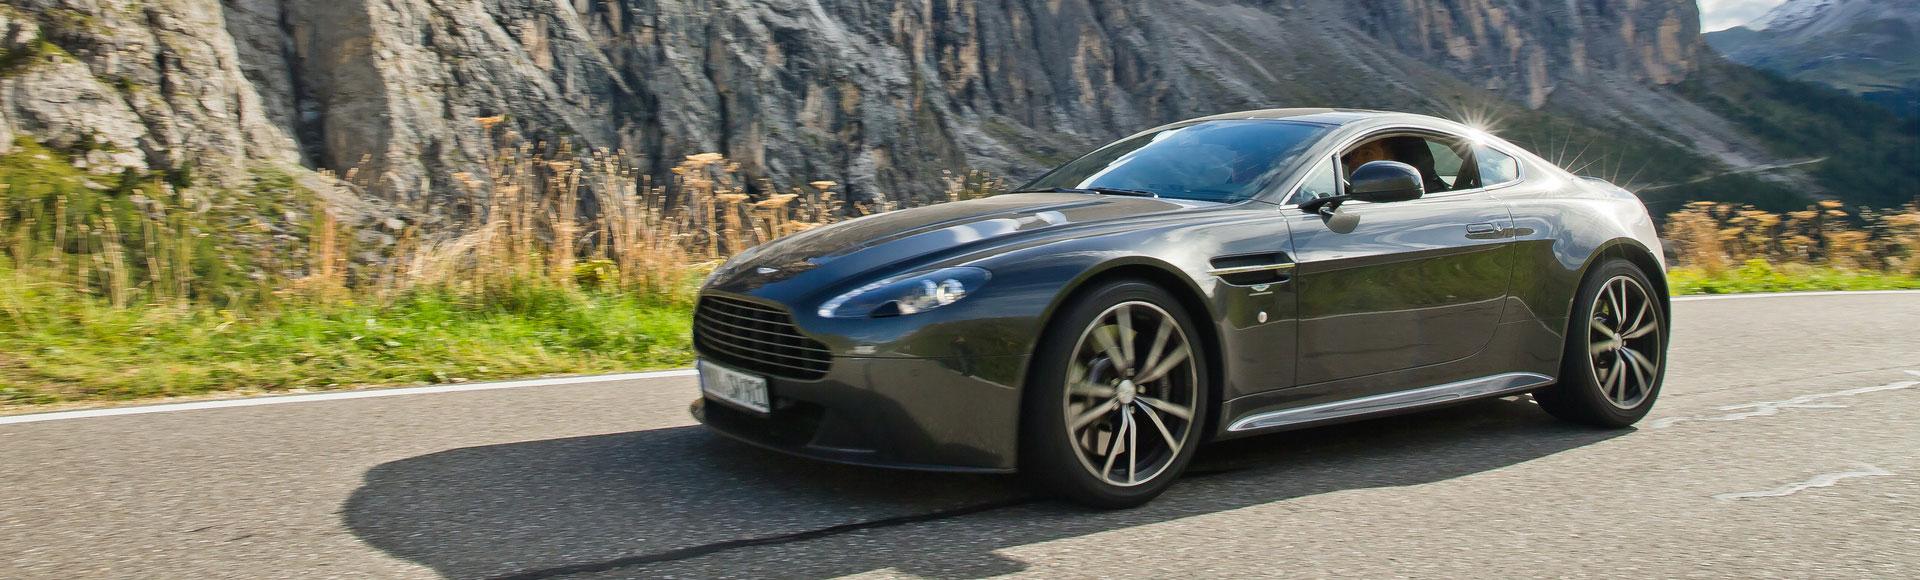 Aston Martin Vantage V8 S SP10 2015 0268 Sommer